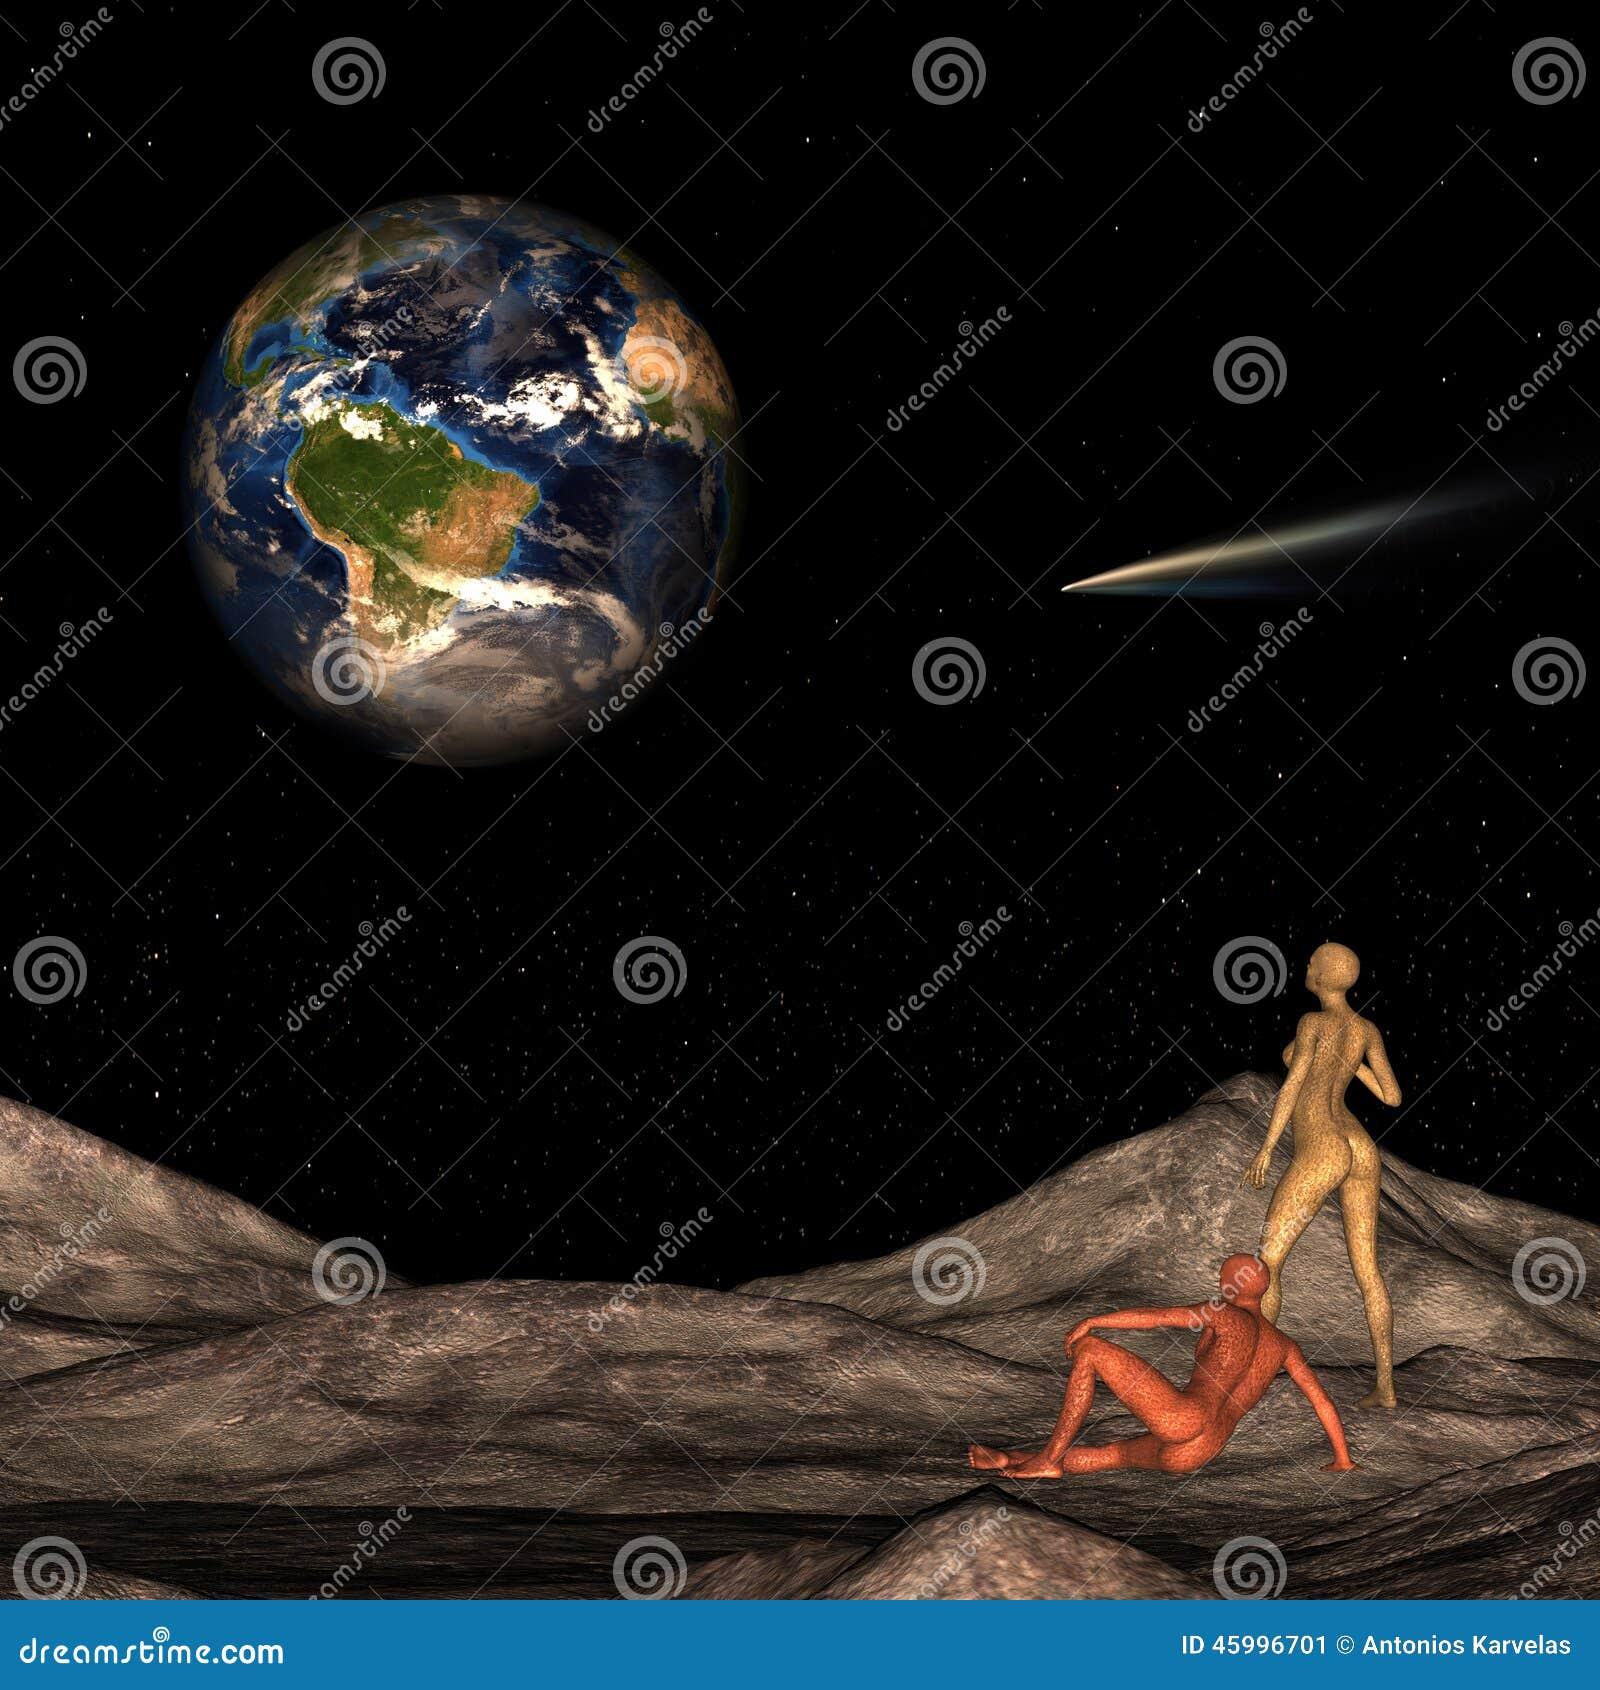 nasa aliens on earth - photo #12